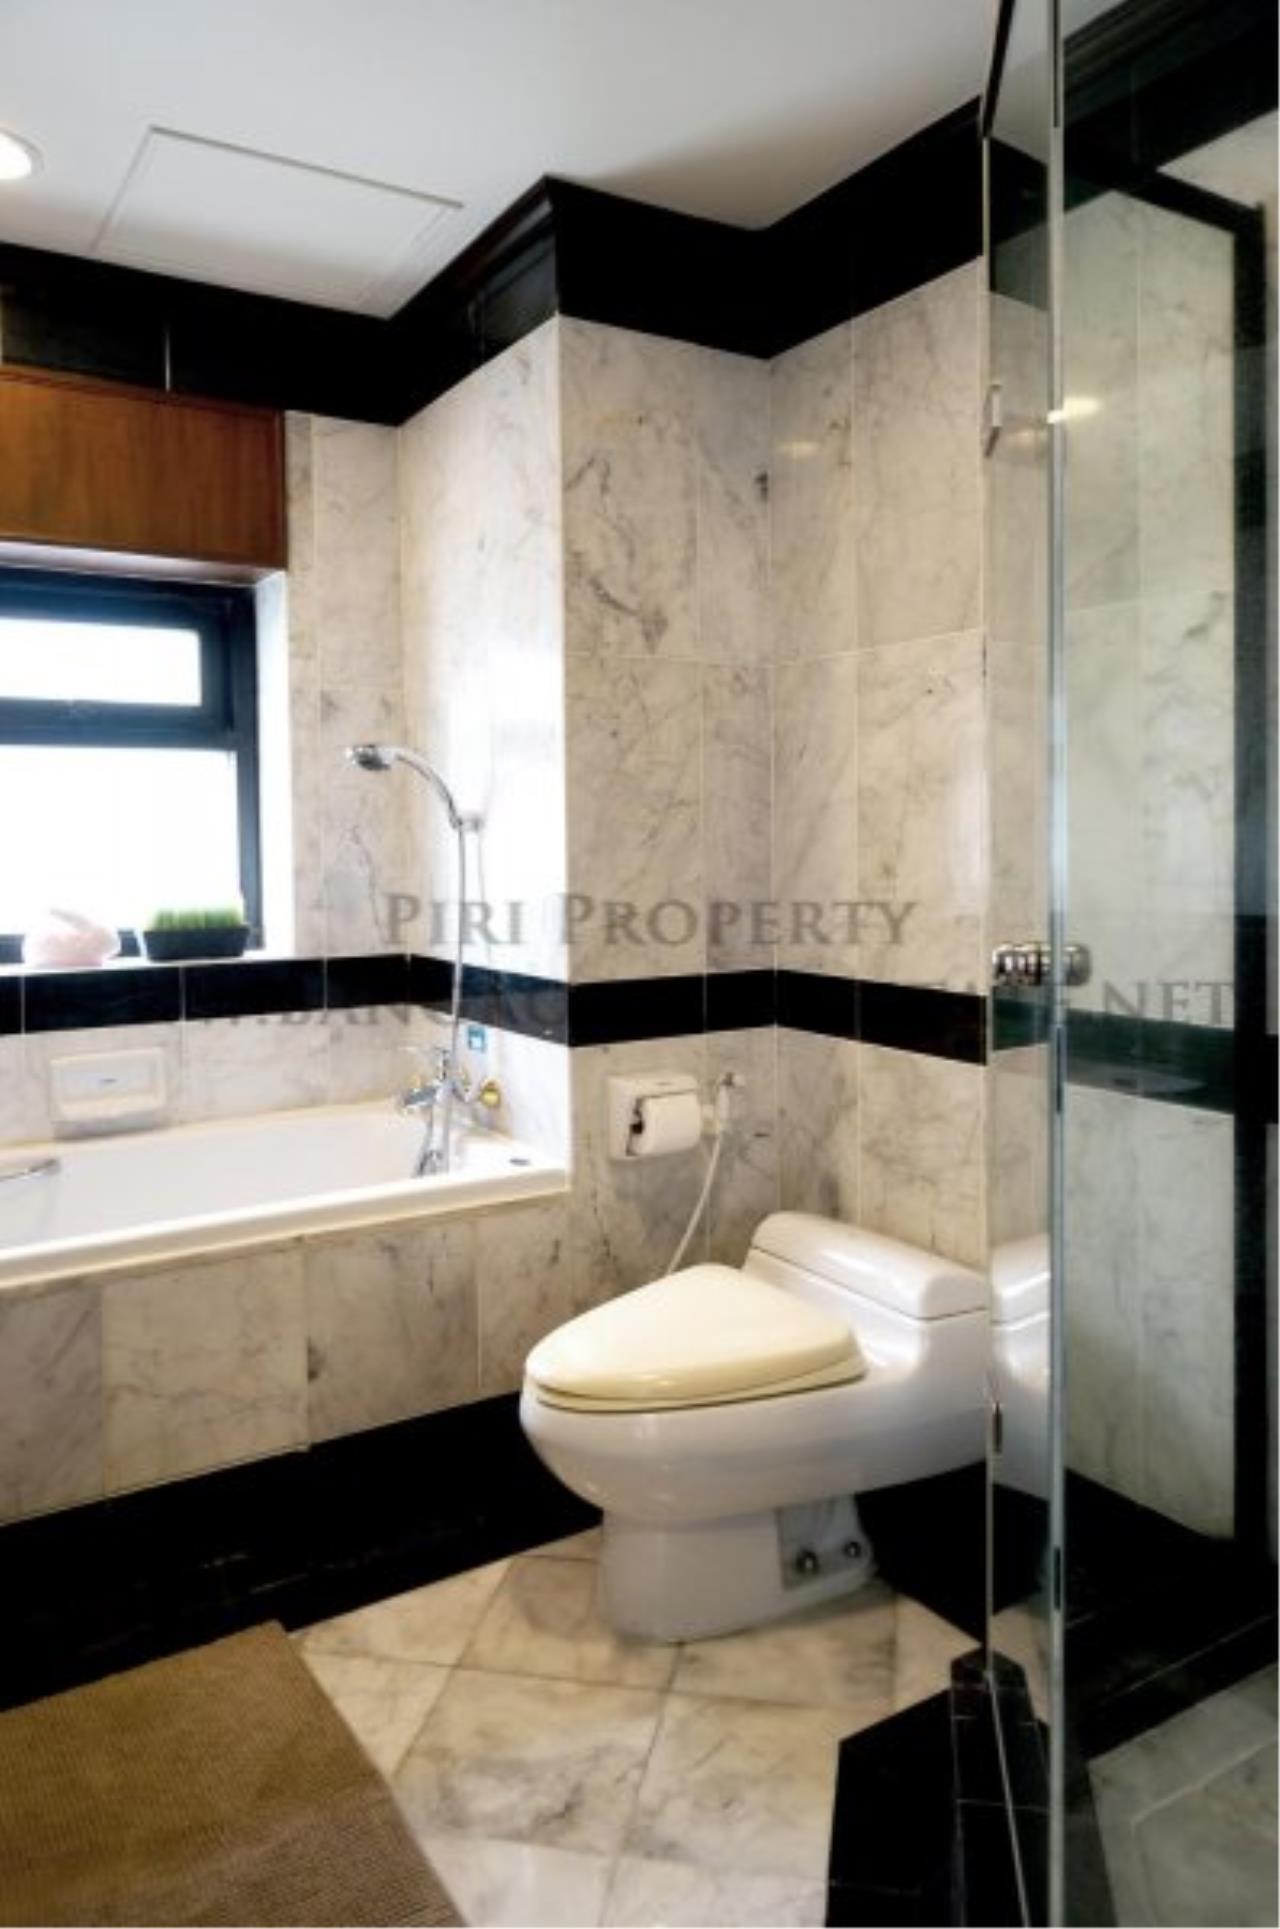 Piri Property Agency's Renovated Condo in Baan Piya Sathorn for Rent - 2 Bedrooms 11